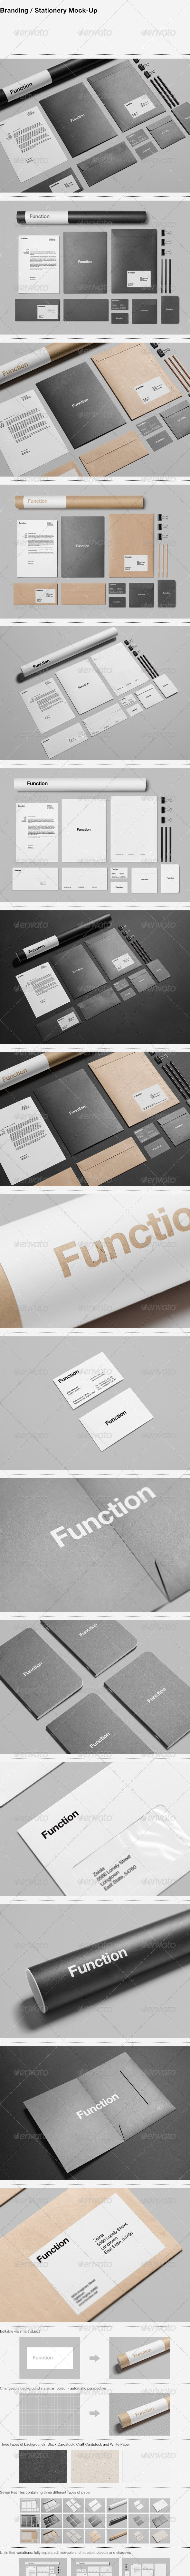 Branding / Stationery Mock-Up - Stationery Print